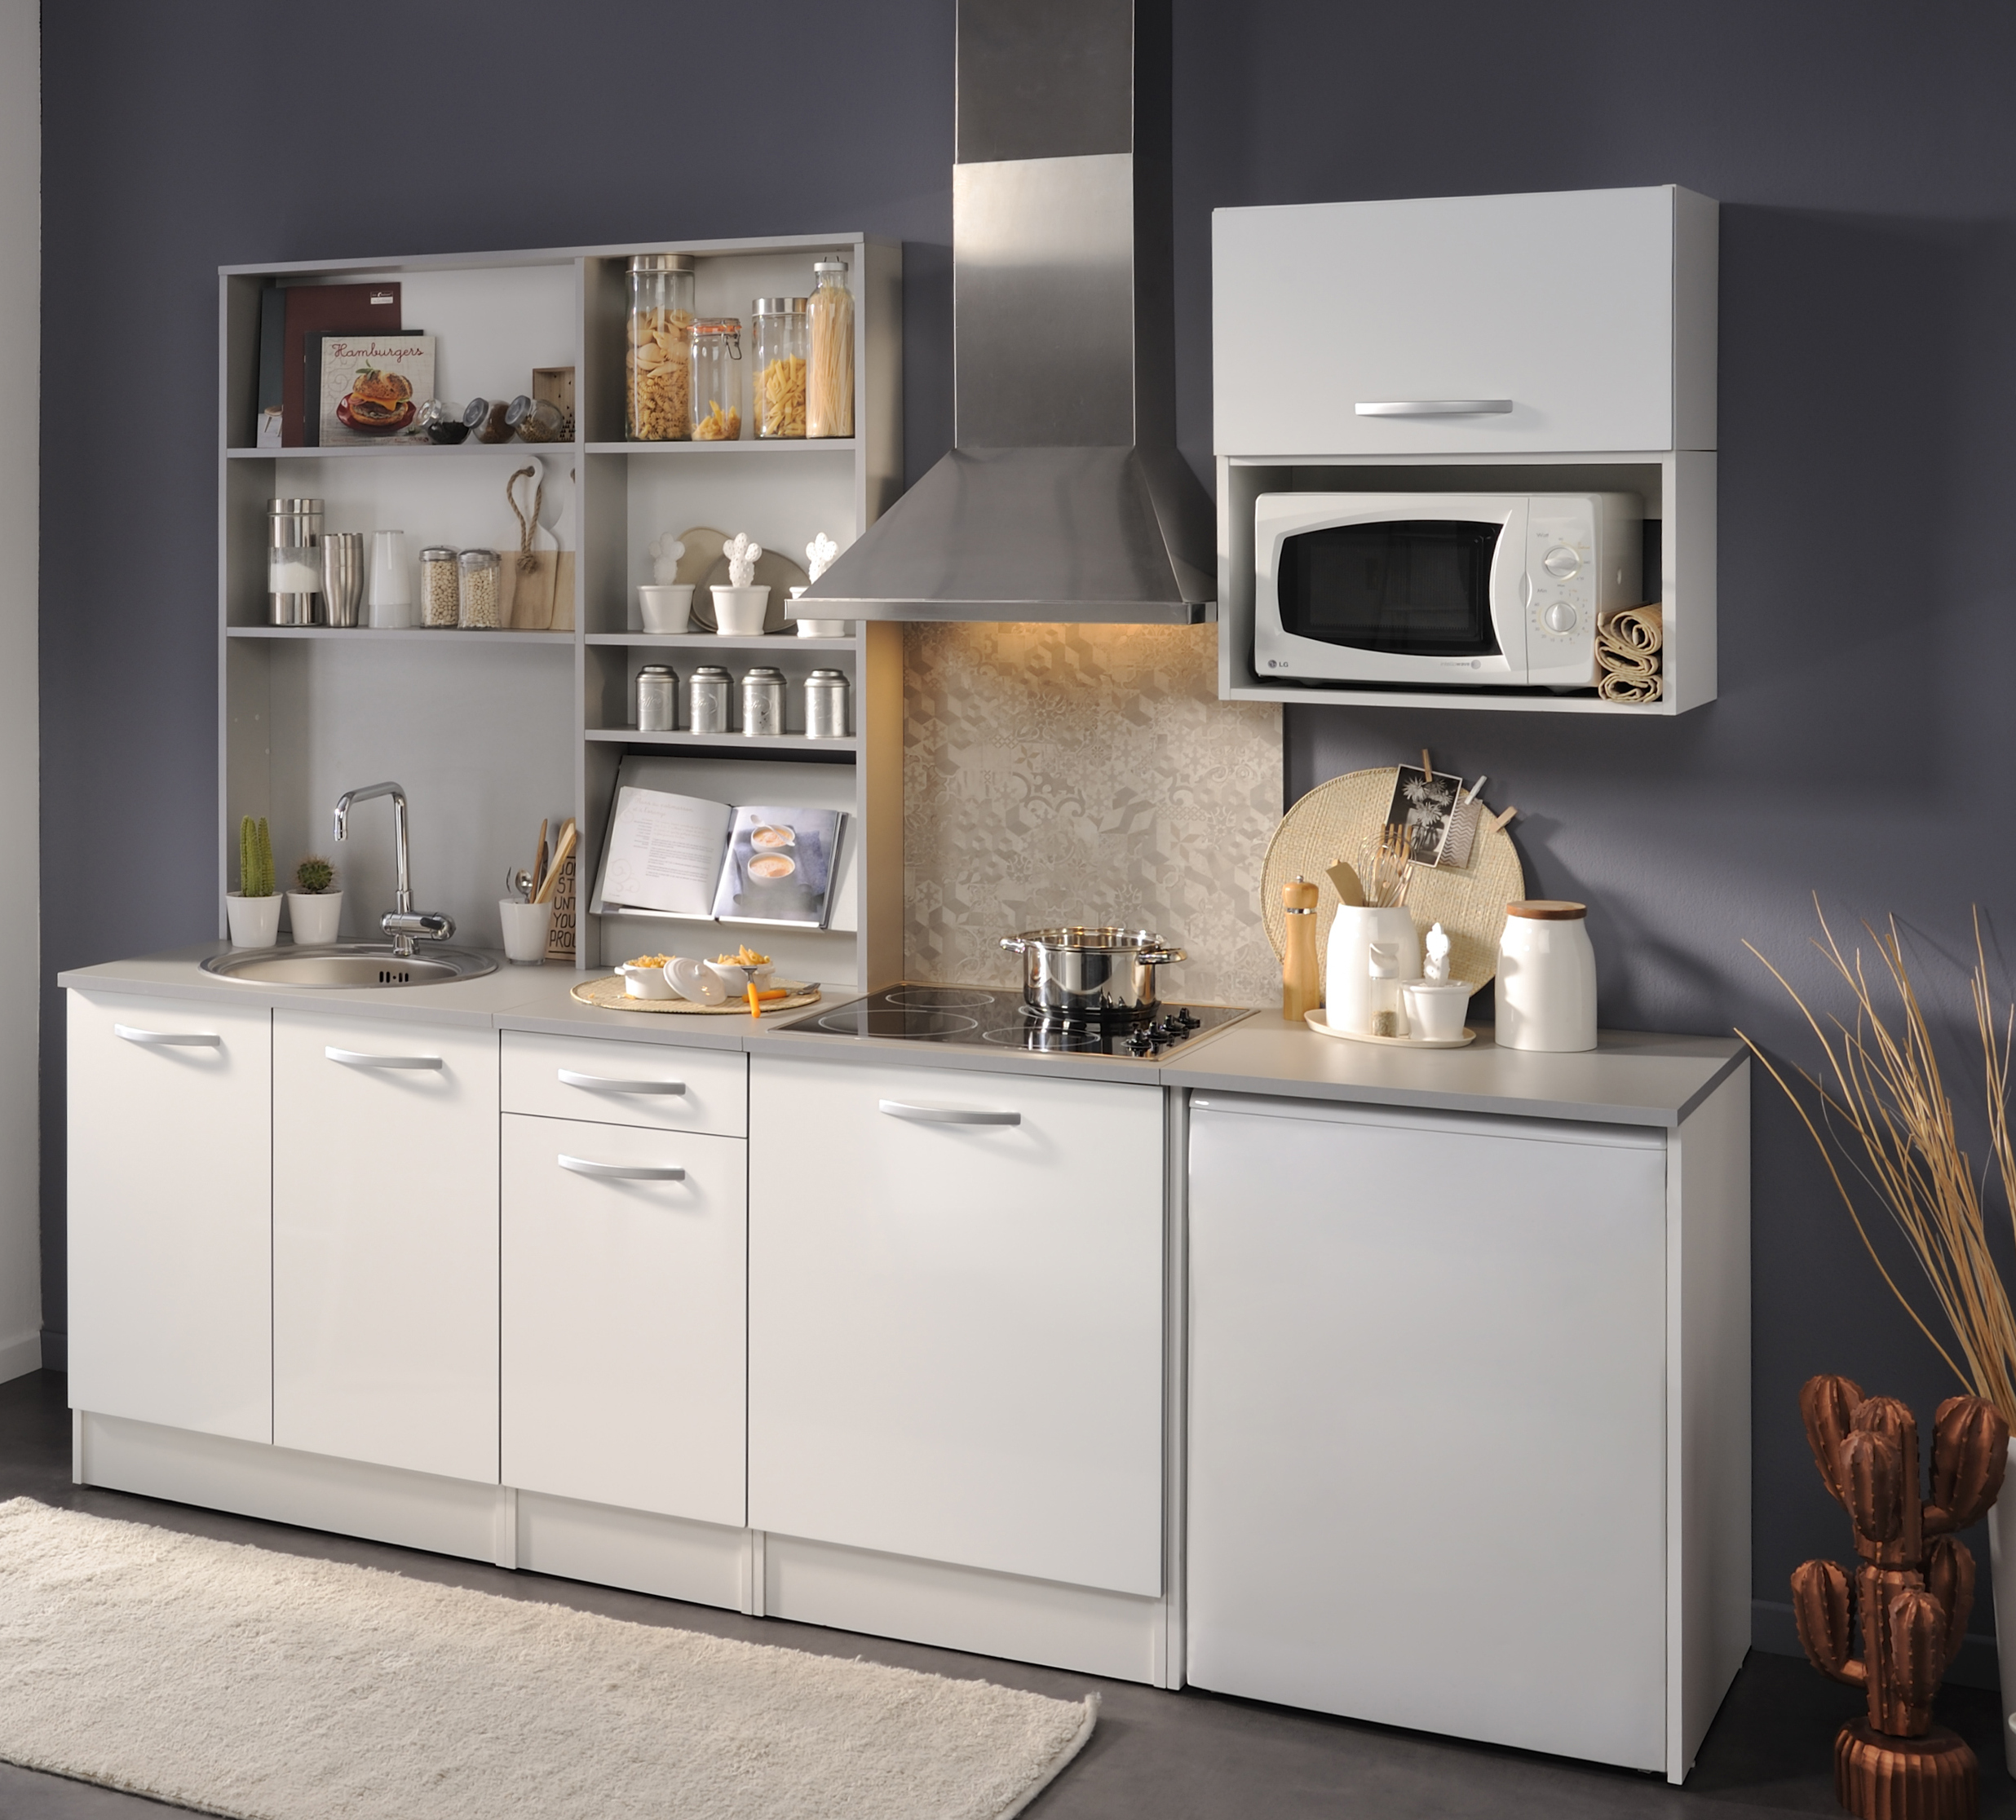 Küchenblock ohne E-Geräte u Spüle Spoon Natura 1 von Parisot ...